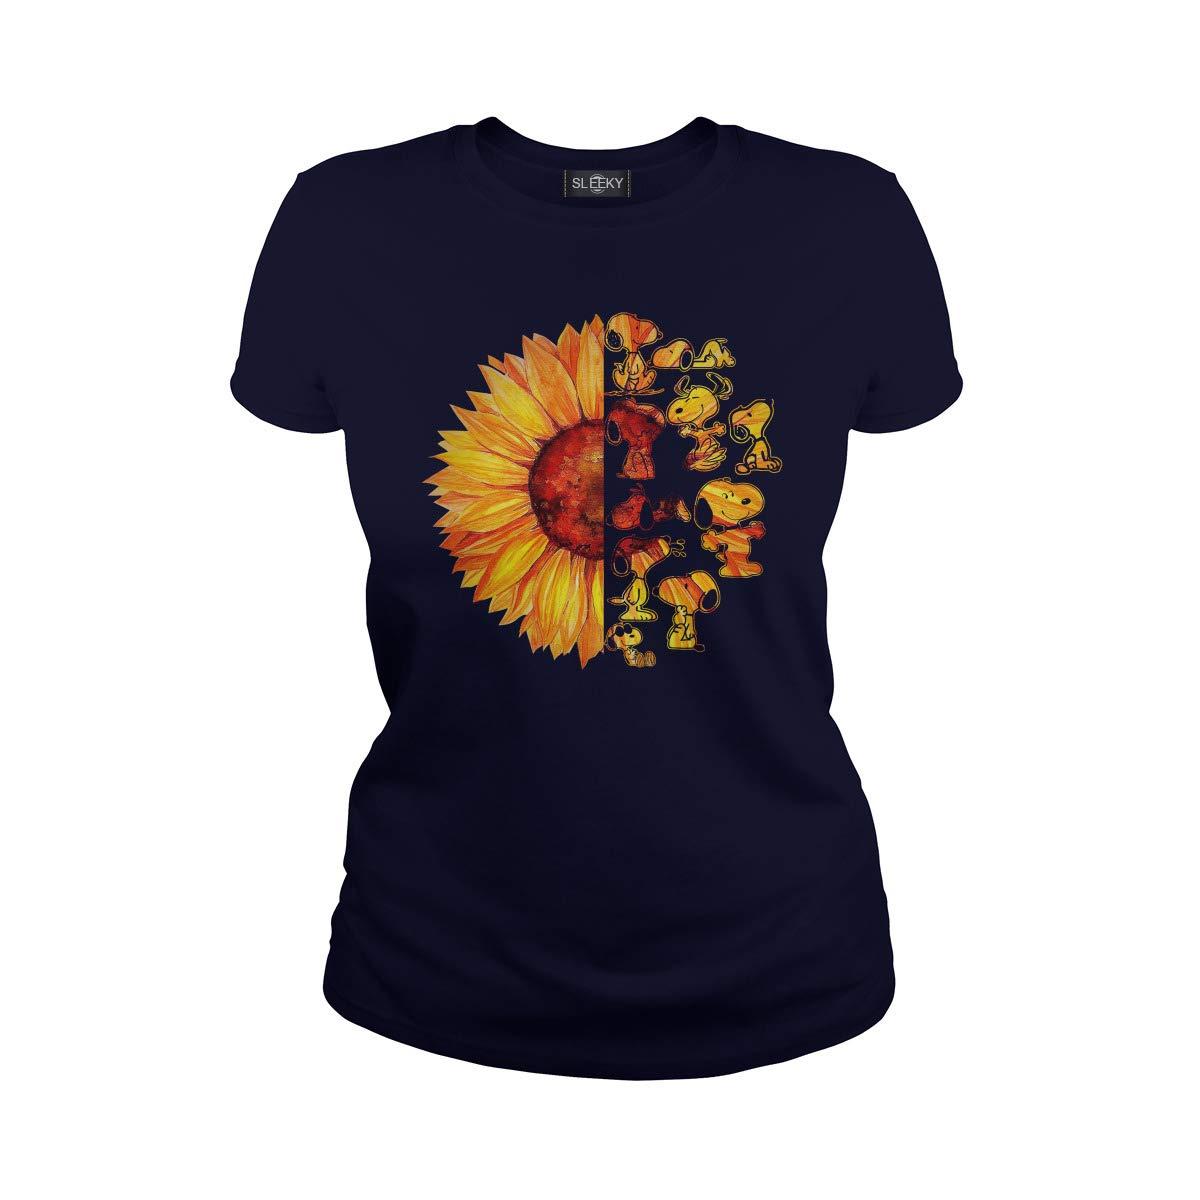 Snoopy Sunflower T-Shirt